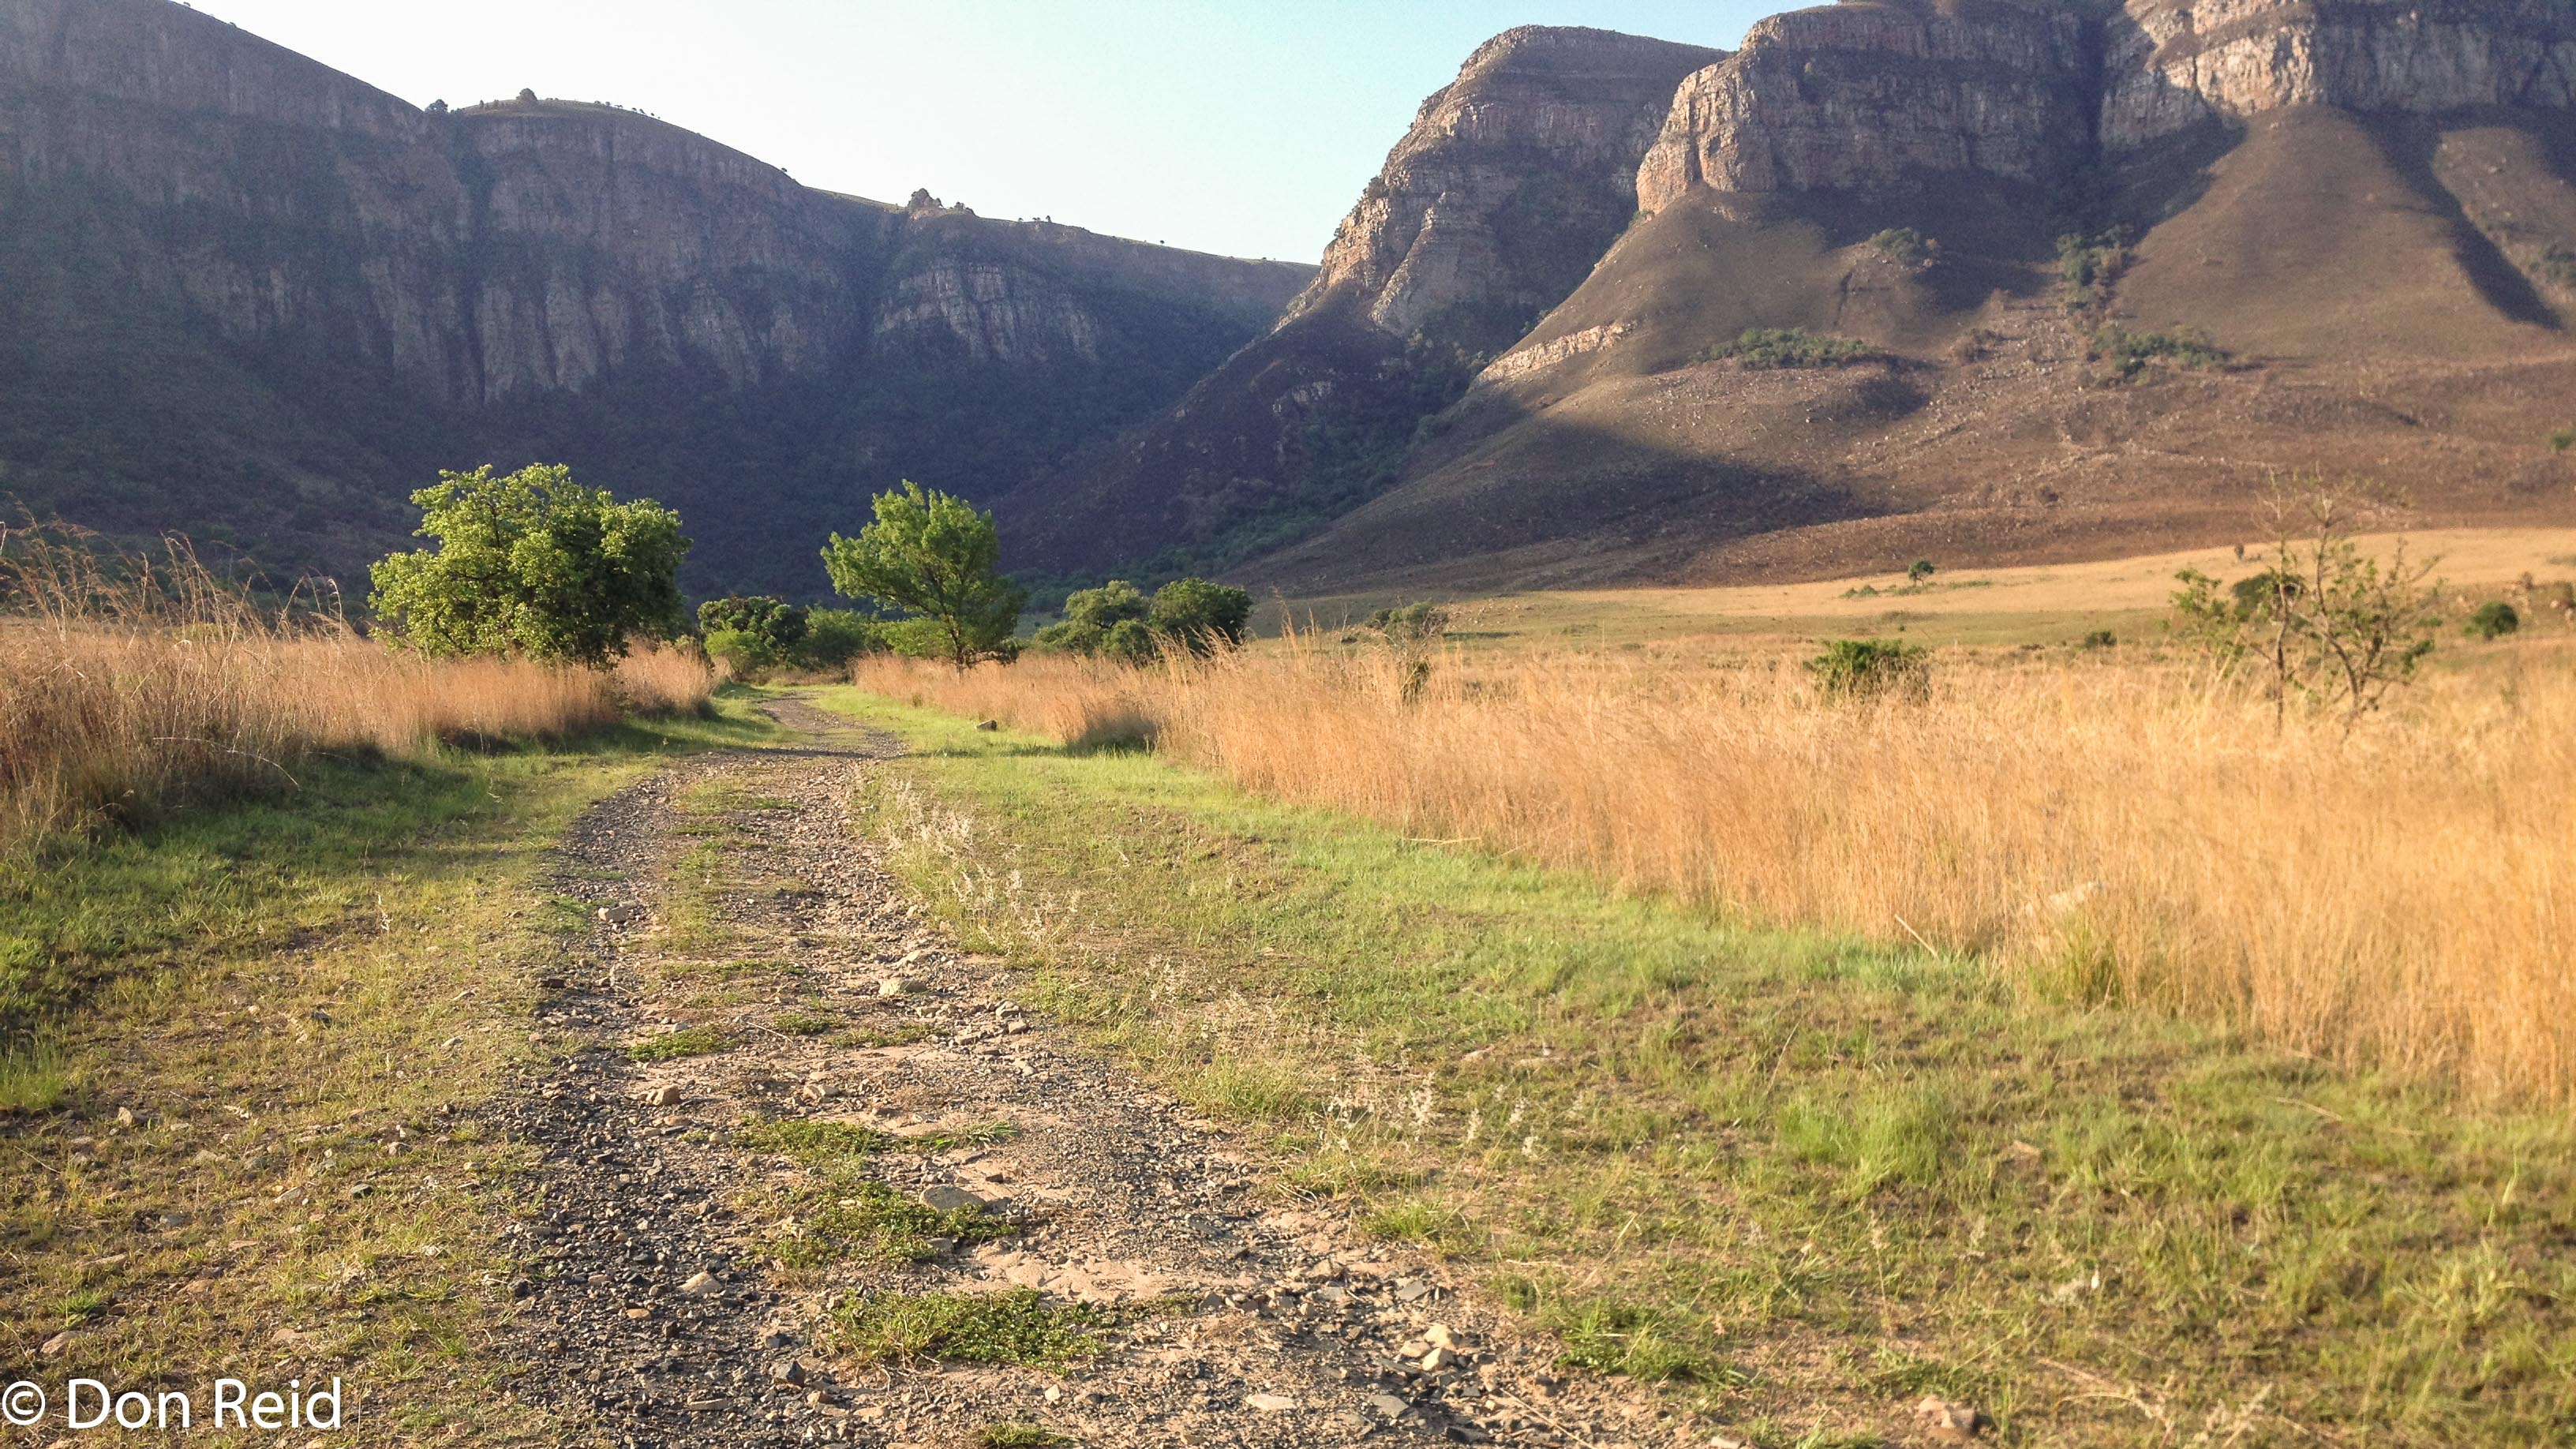 Mountain bike trail, Verlorenkloof